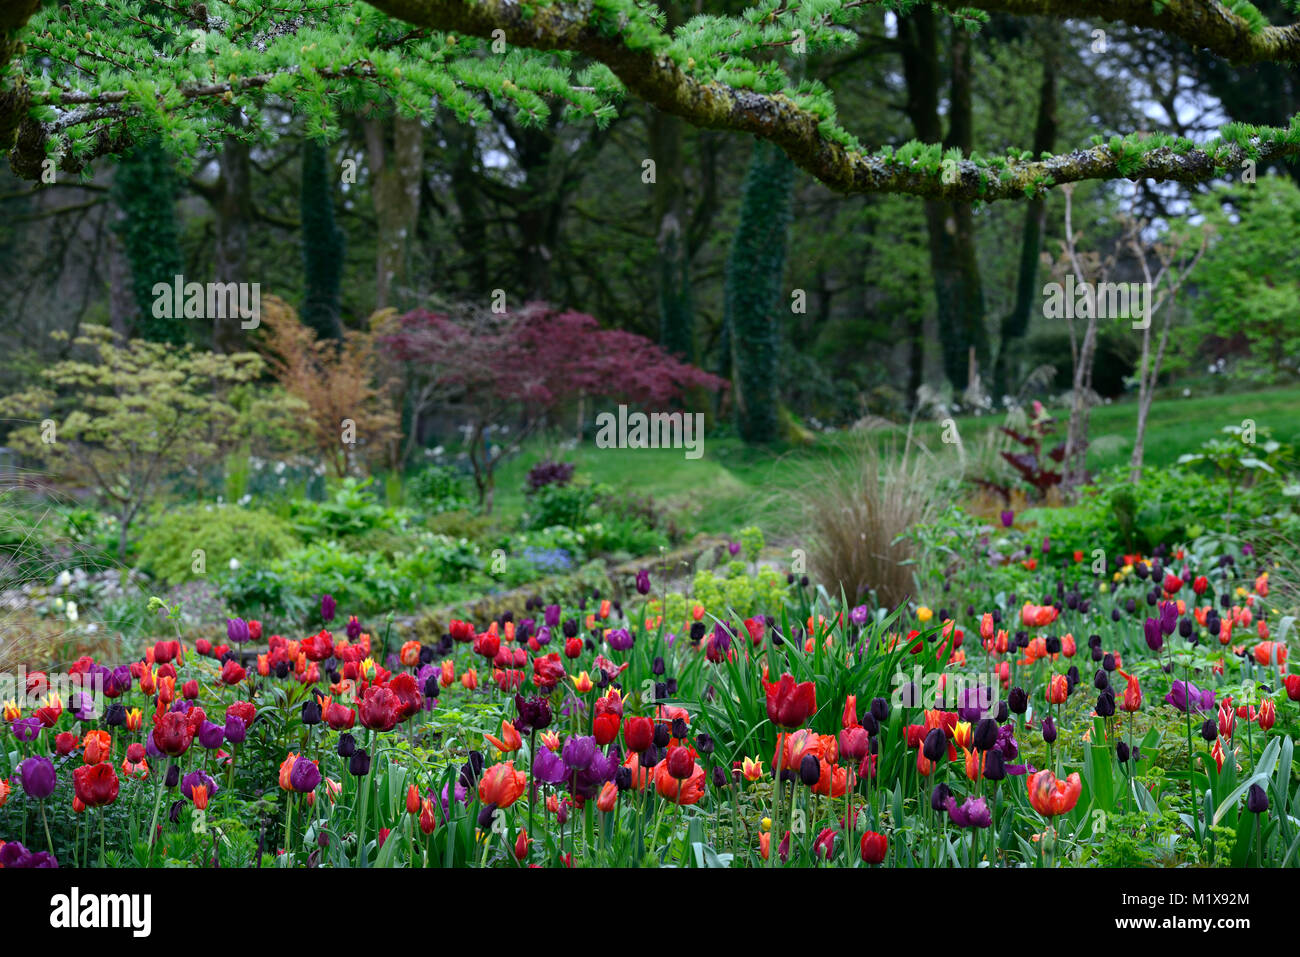 June Blakes Garden,Wicklow,Tulip display,tulips,tulipa,tulip flower power,tulip lasting love,tulip Paul scherer,tulip - Stock Image